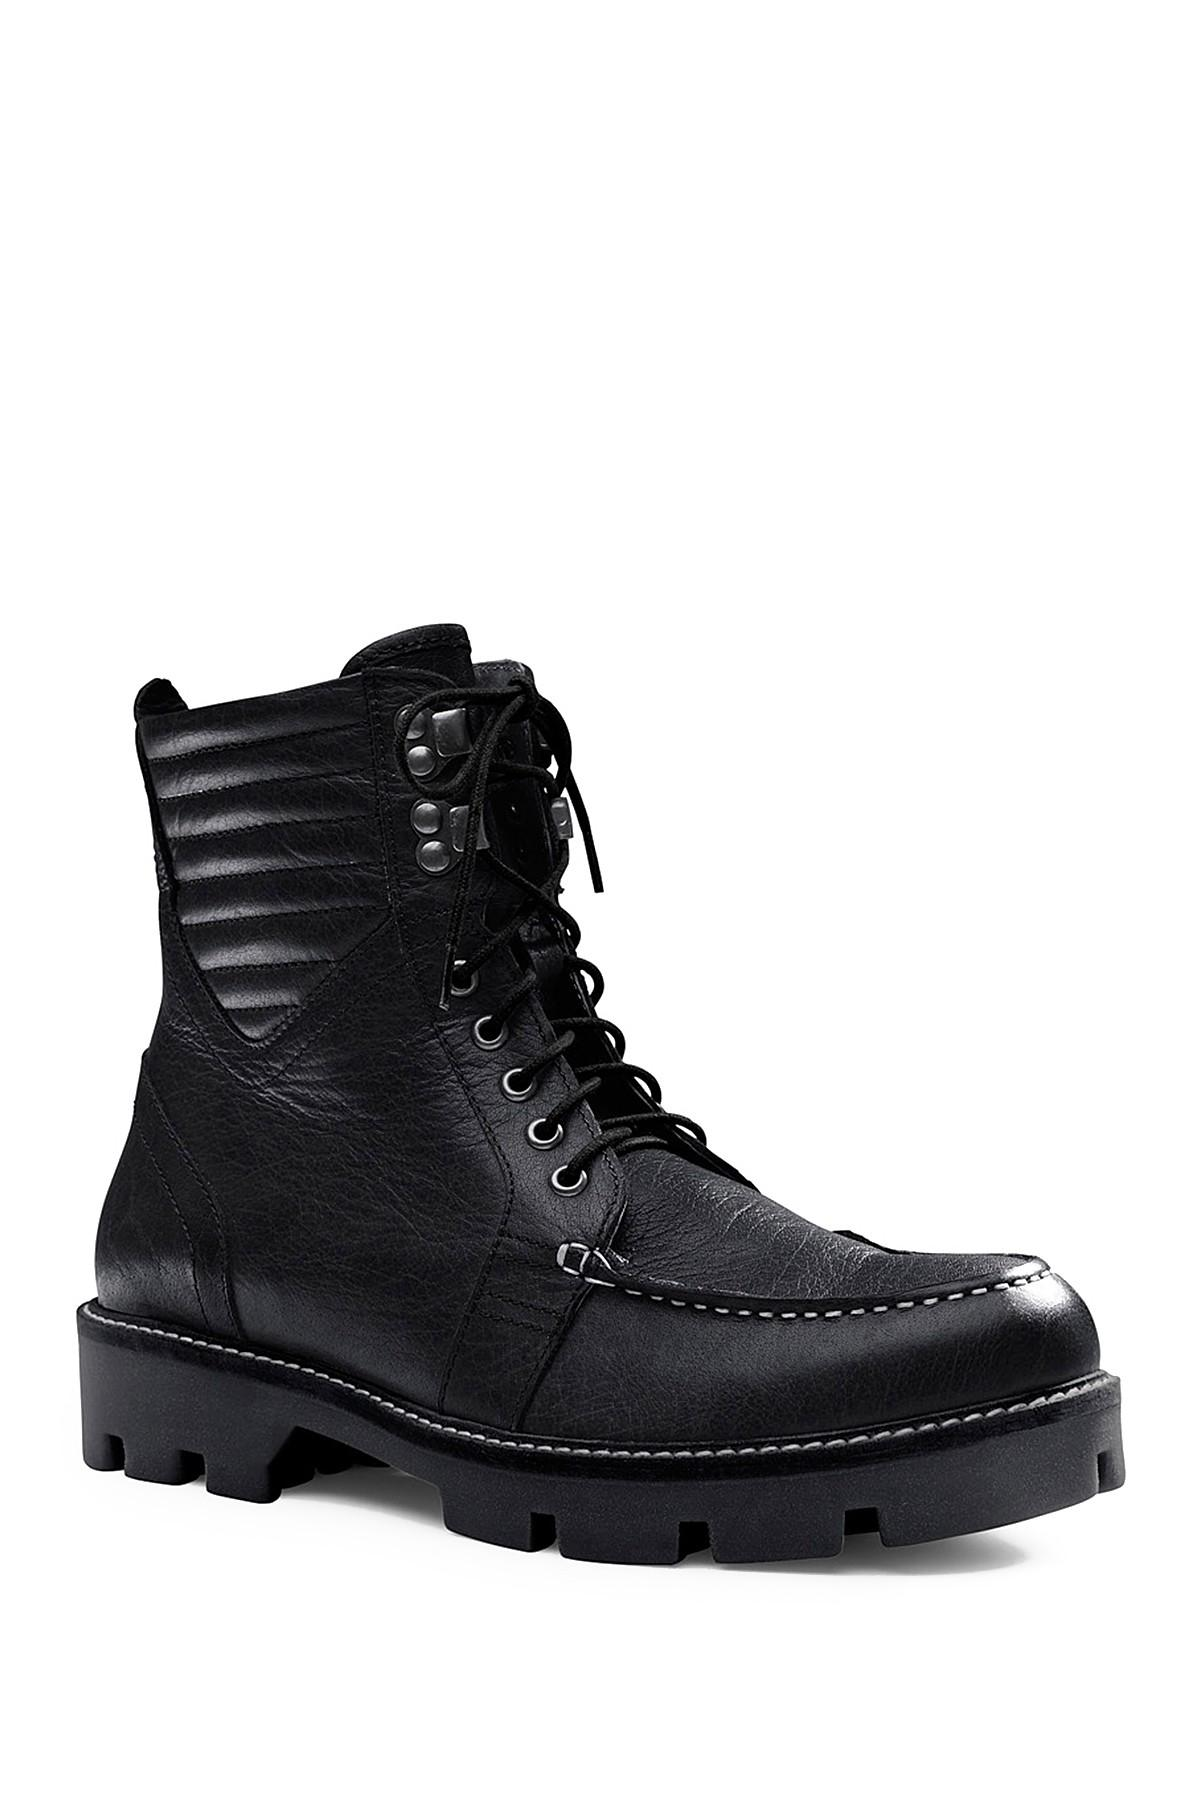 Bally Mens Shoes Nordstrom Rack